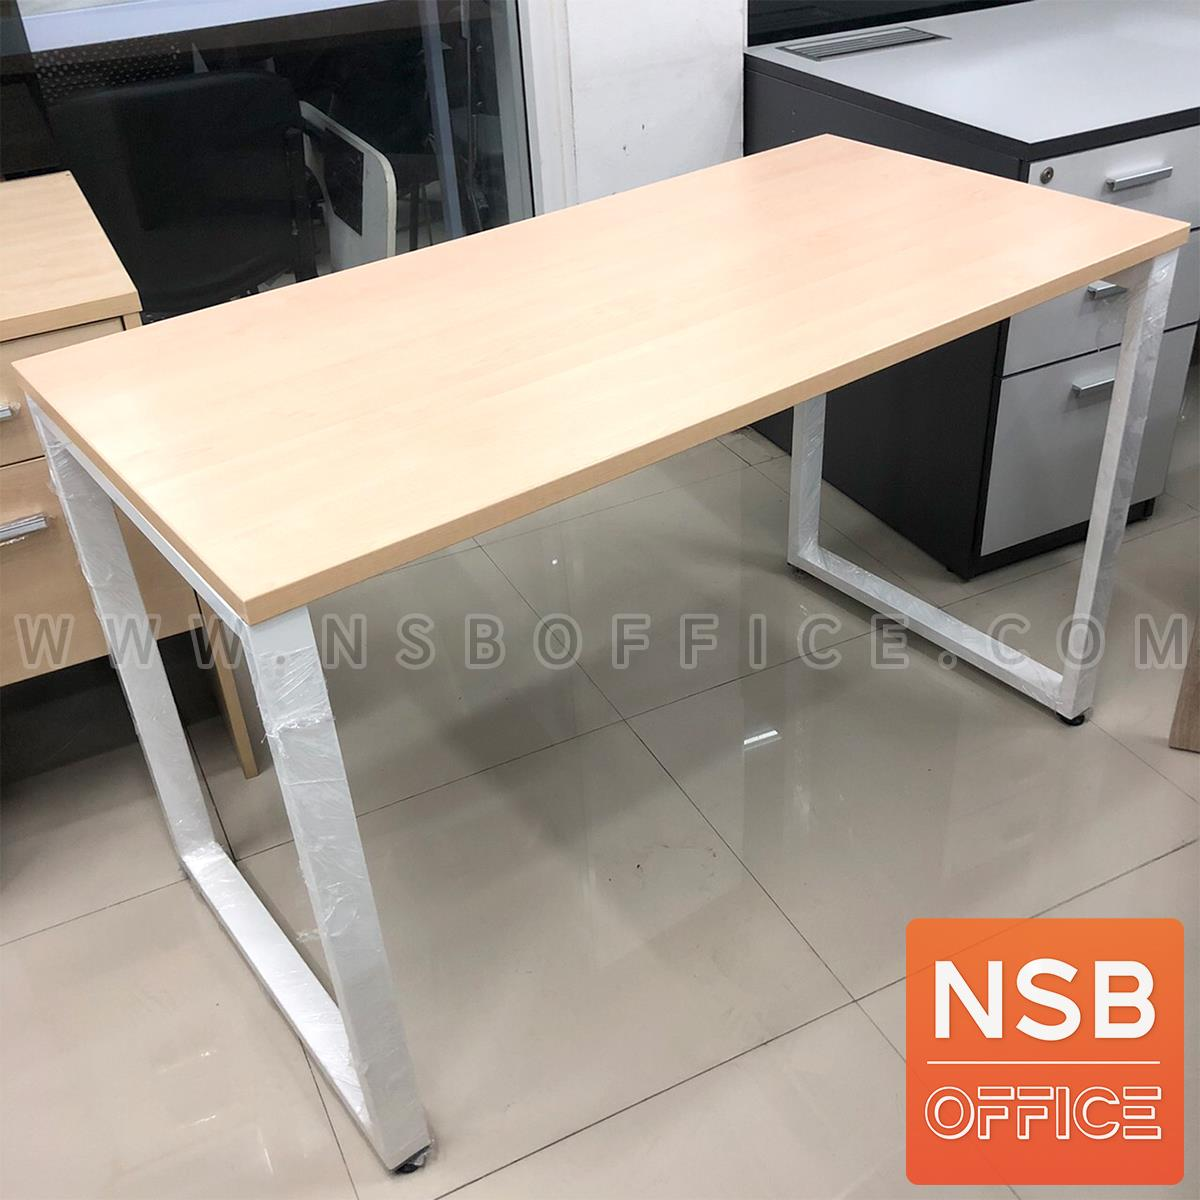 A41A002:โต๊ะทำงานโล่ง รุ่น Adaline (อดาลิน) ขนาด 100W,120W*60D*75H cm. ขาเหล็กเหลี่ยม